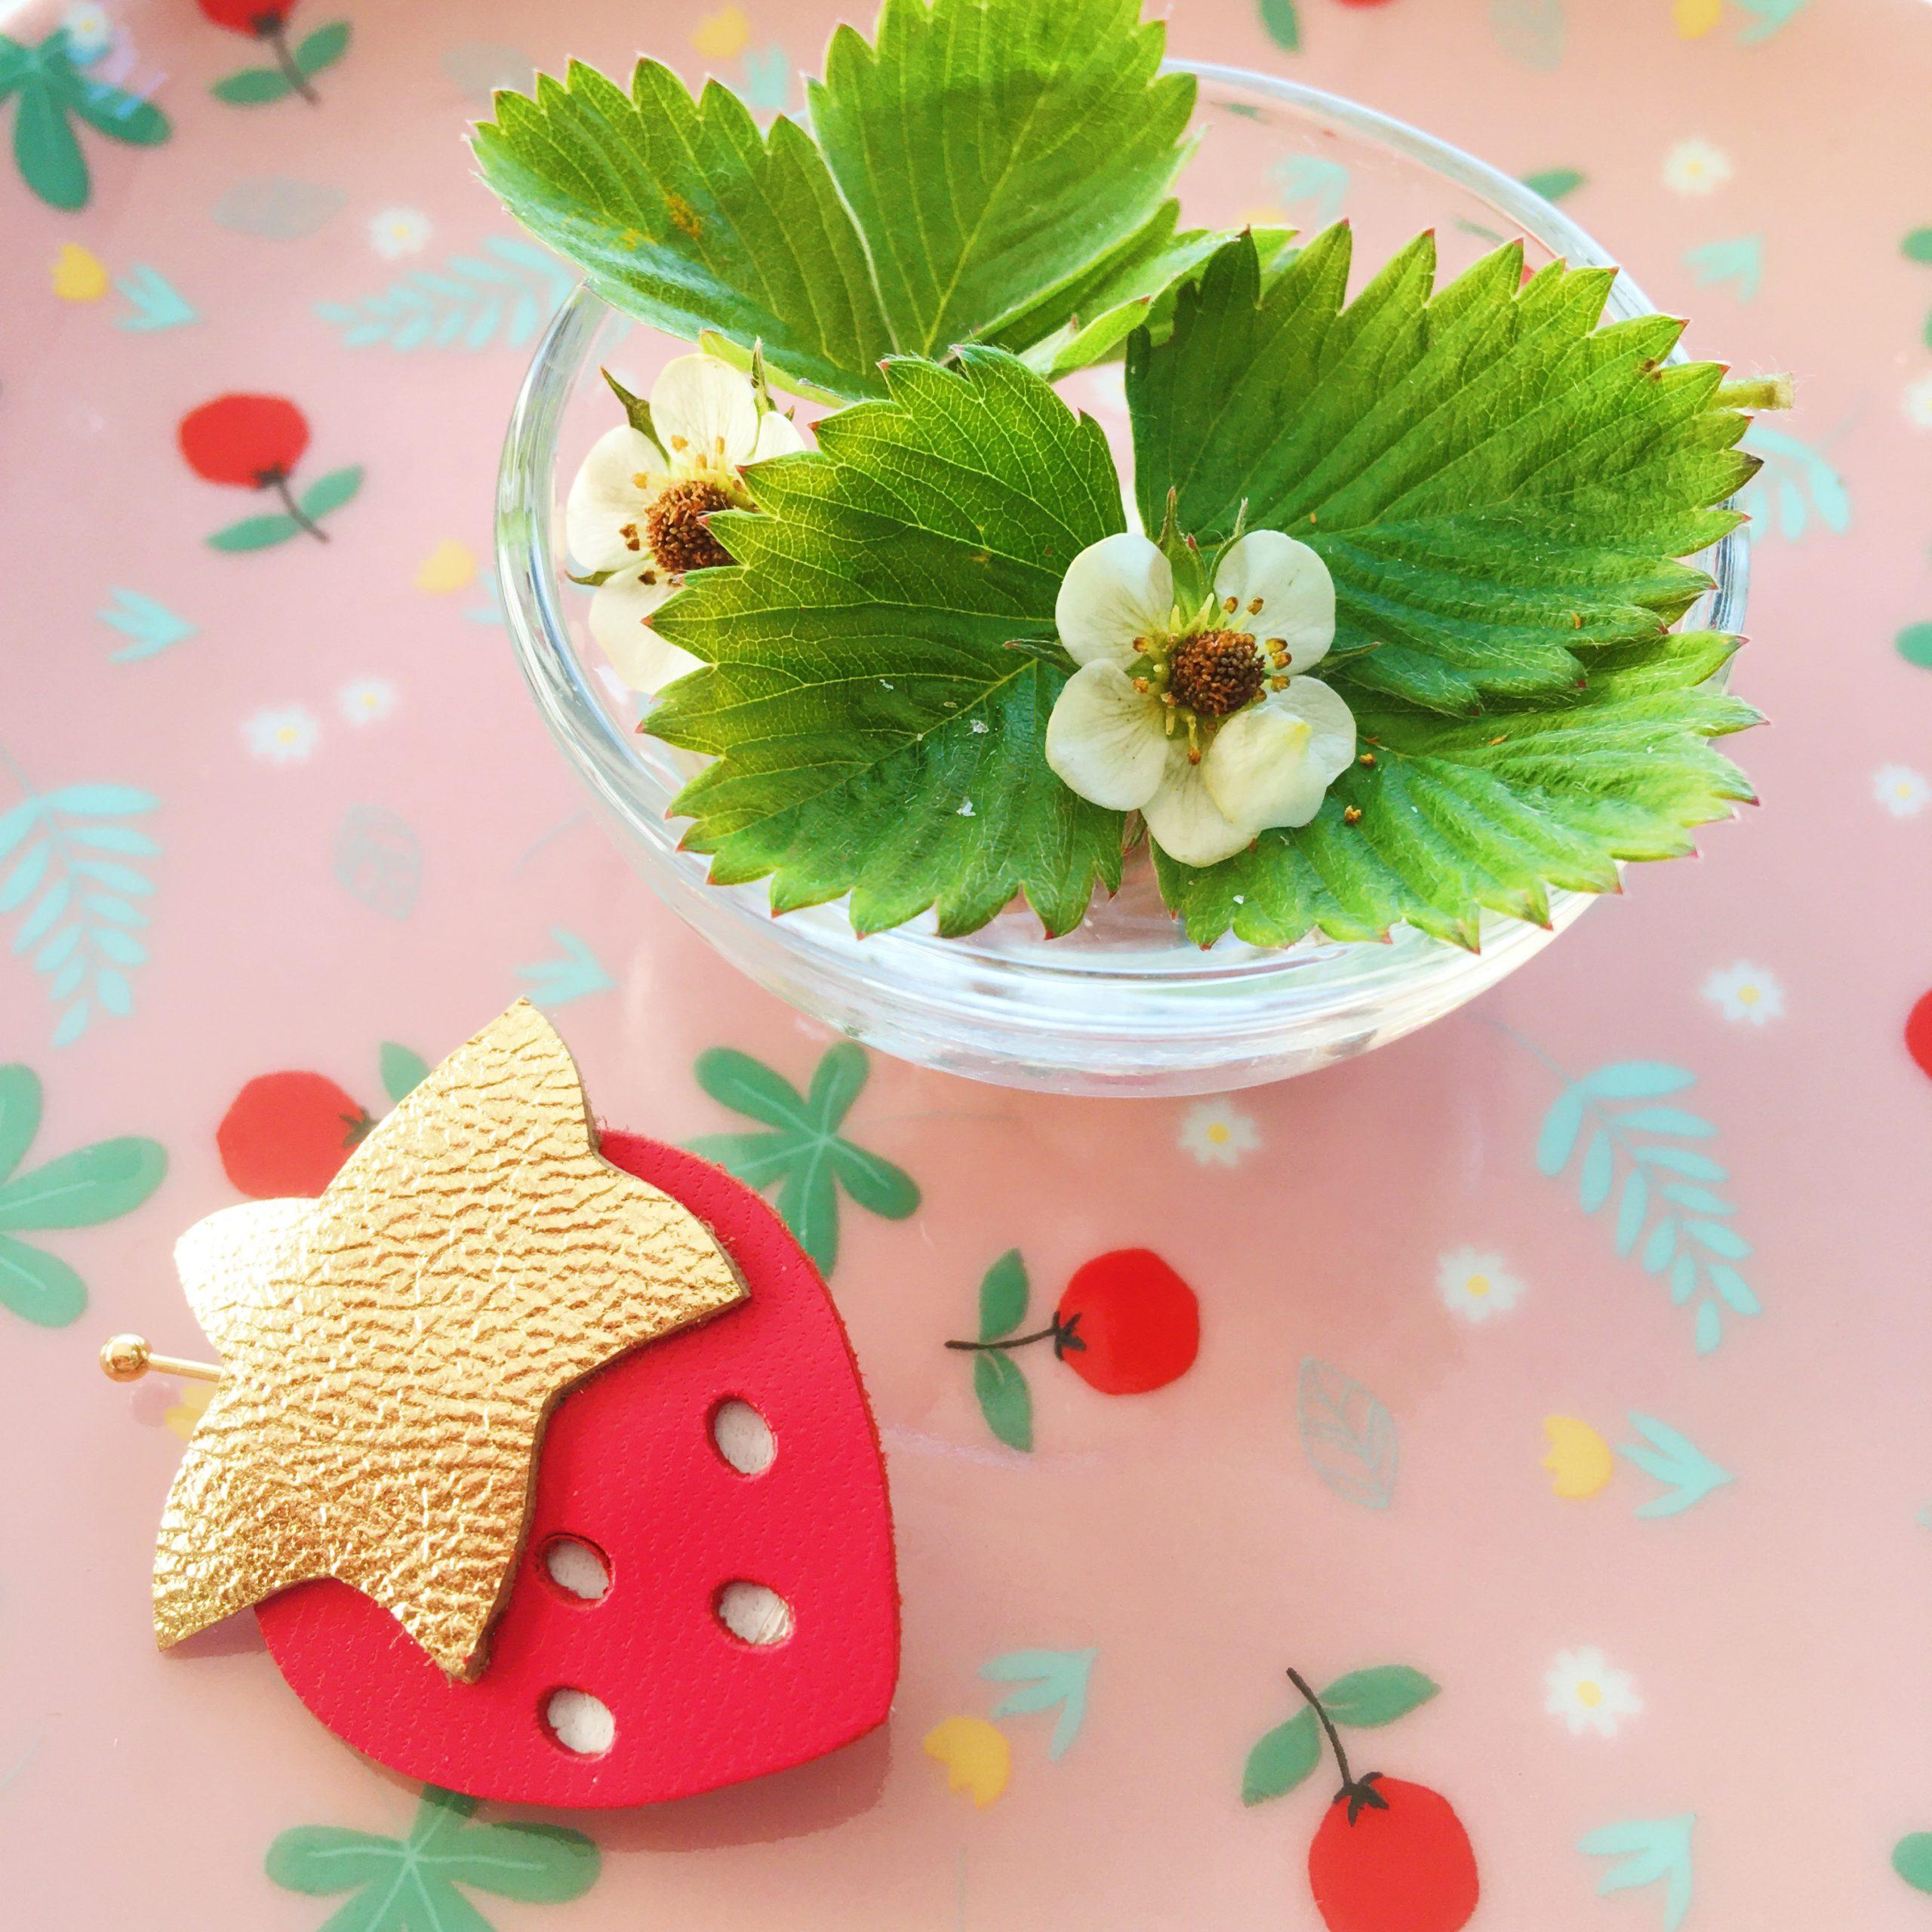 broche fraise rouge et doré made in france - du vent dans mes valises